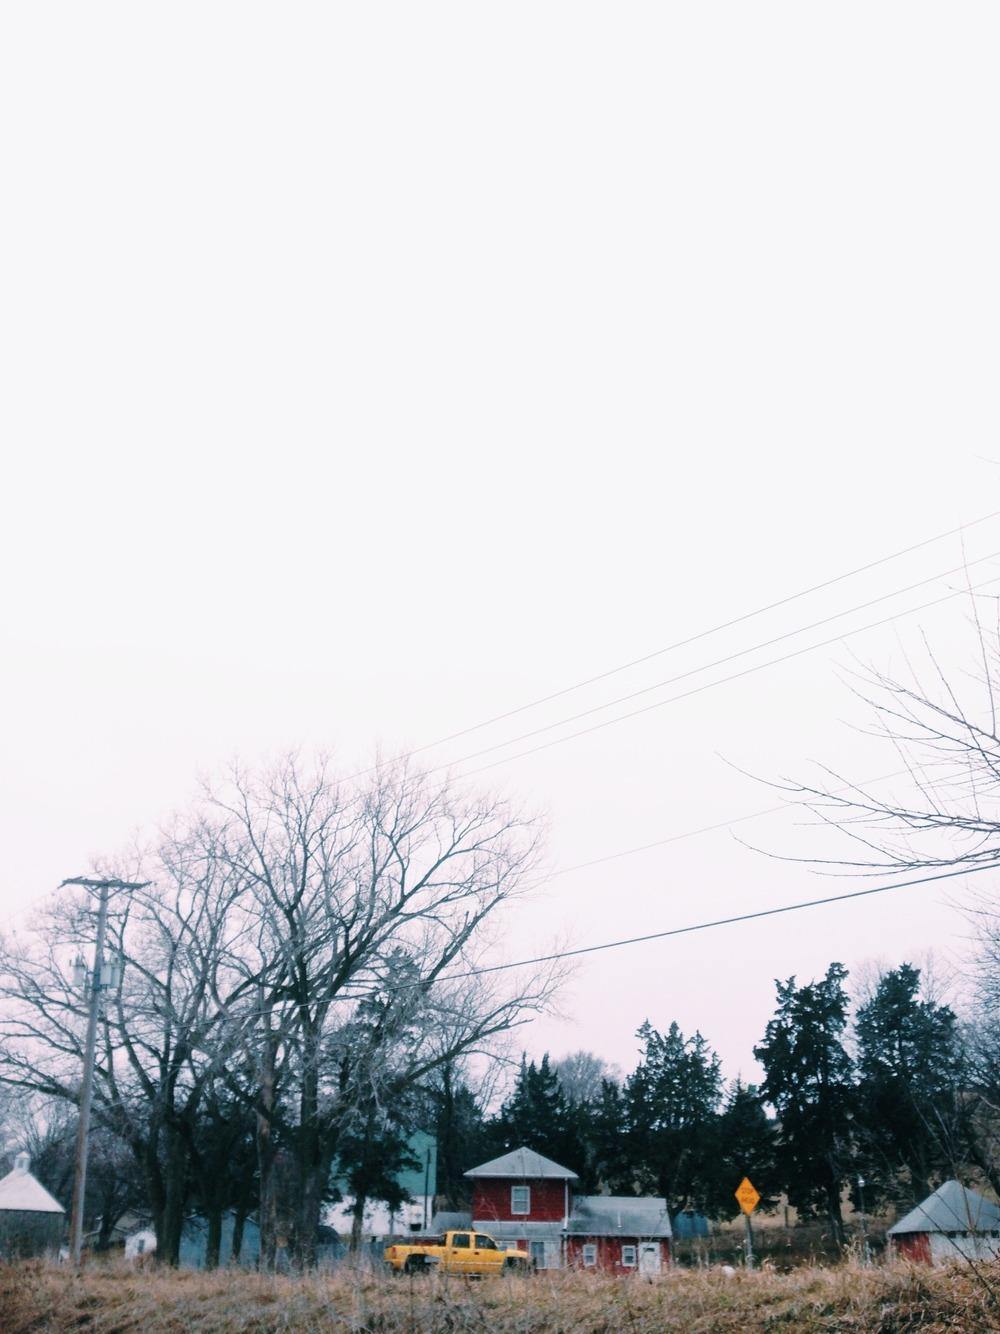 tumblr_ni2x49FSBA1qldwfho2_1280.jpg